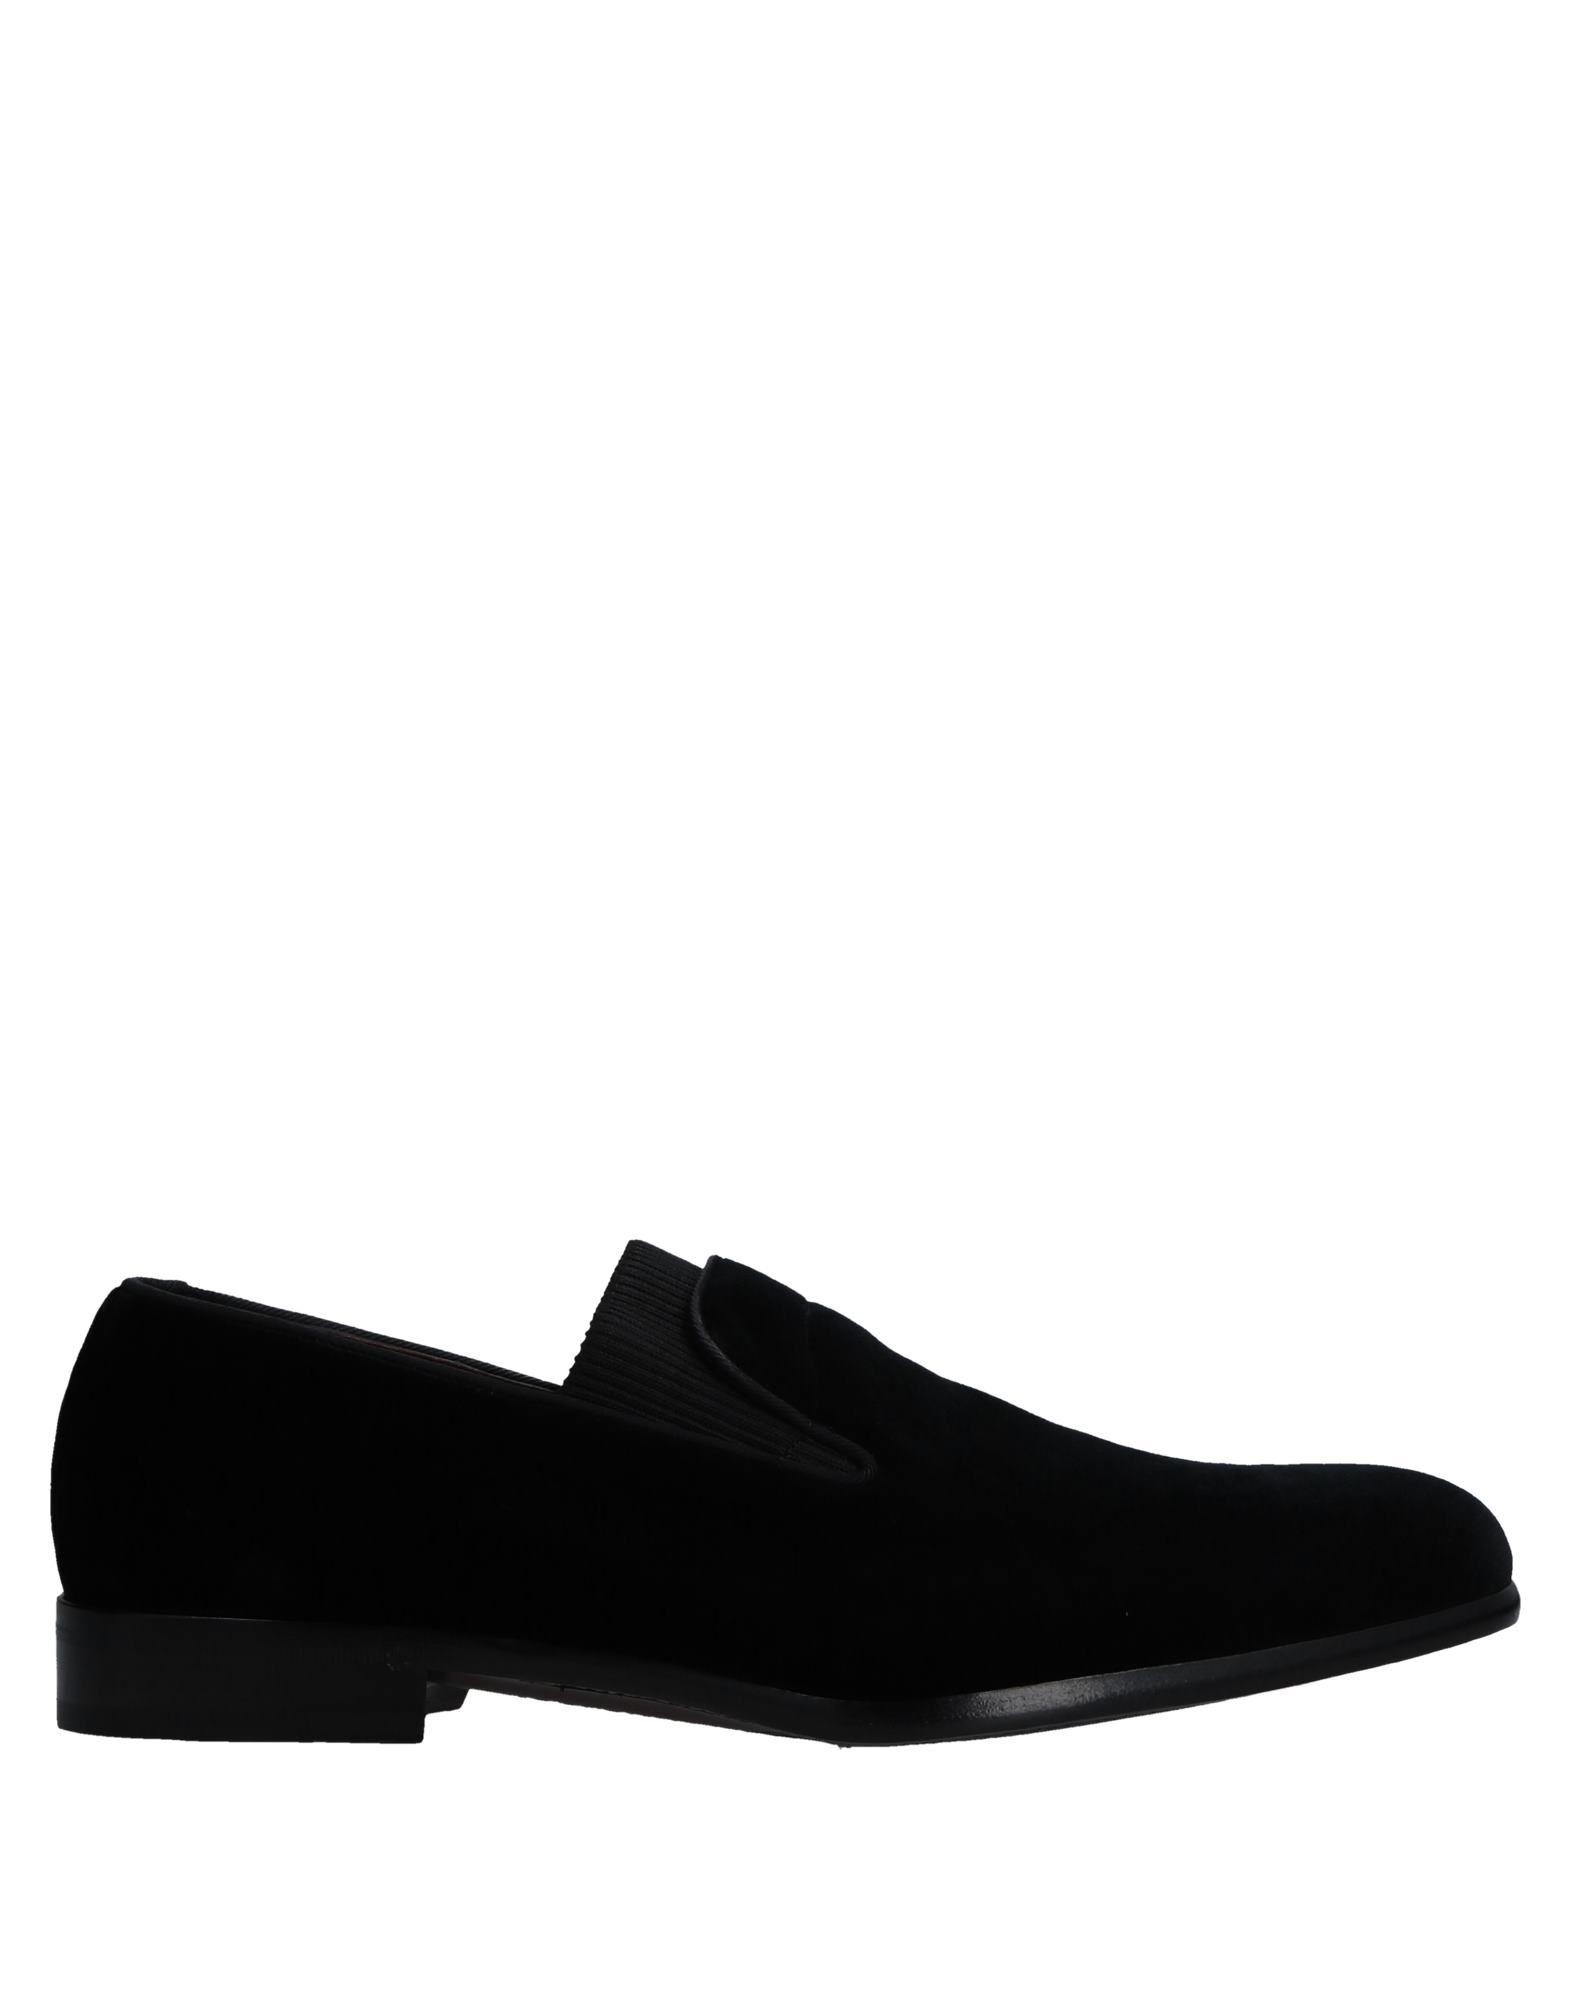 Dolce & Gabbana Mokassins Herren  11519517RI Gute Qualität beliebte Schuhe